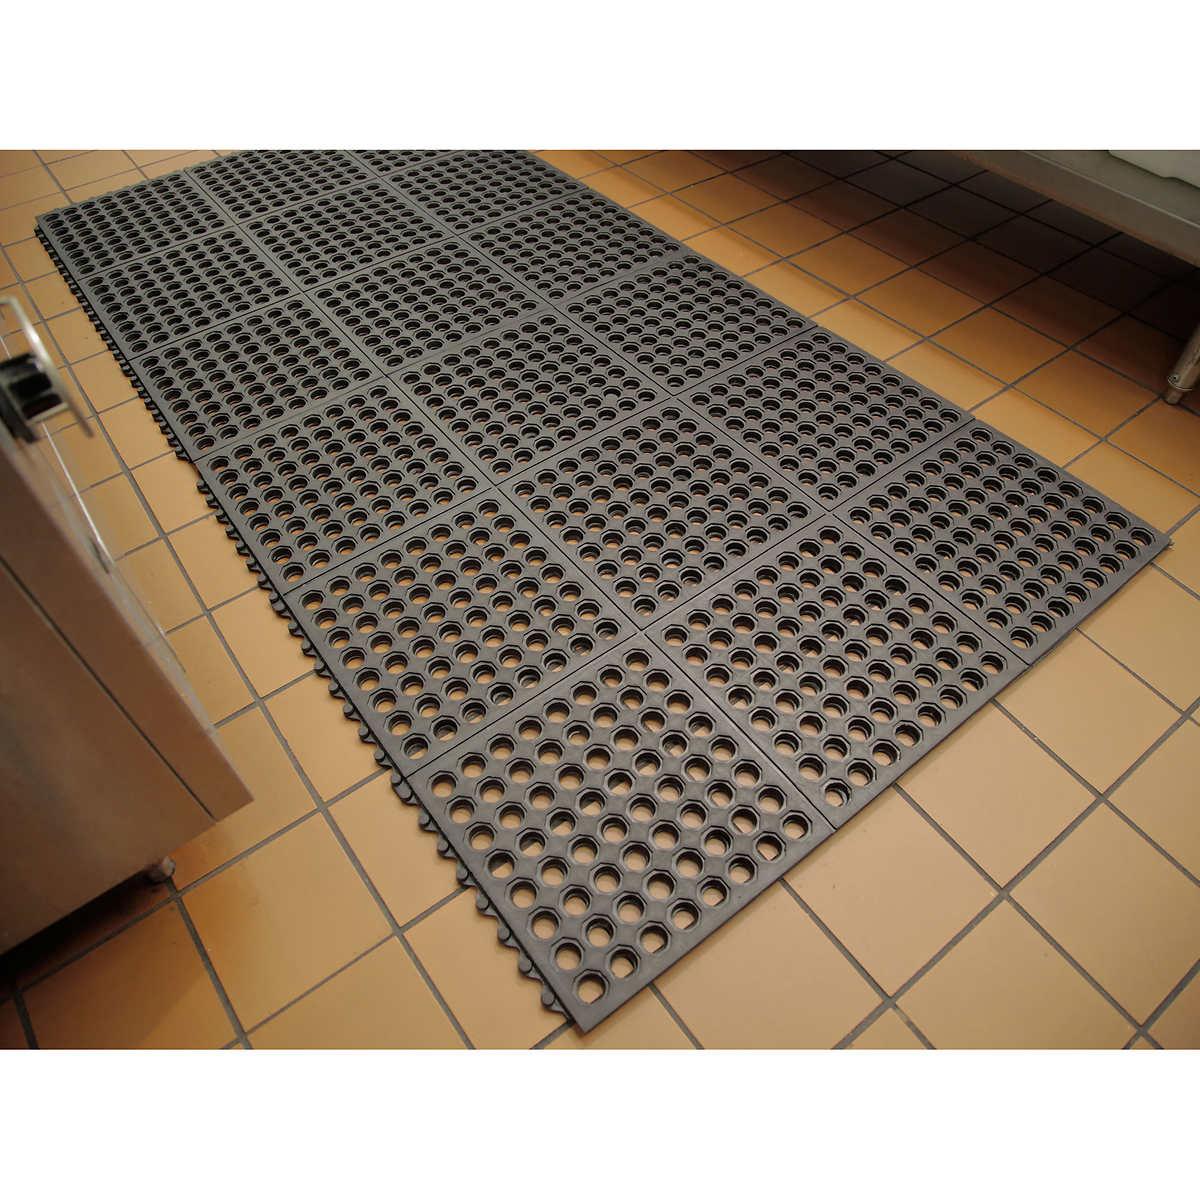 Floor mats us - Cushion Safe 3 Ft X 3 Ft Modular Tiles 2 Pack